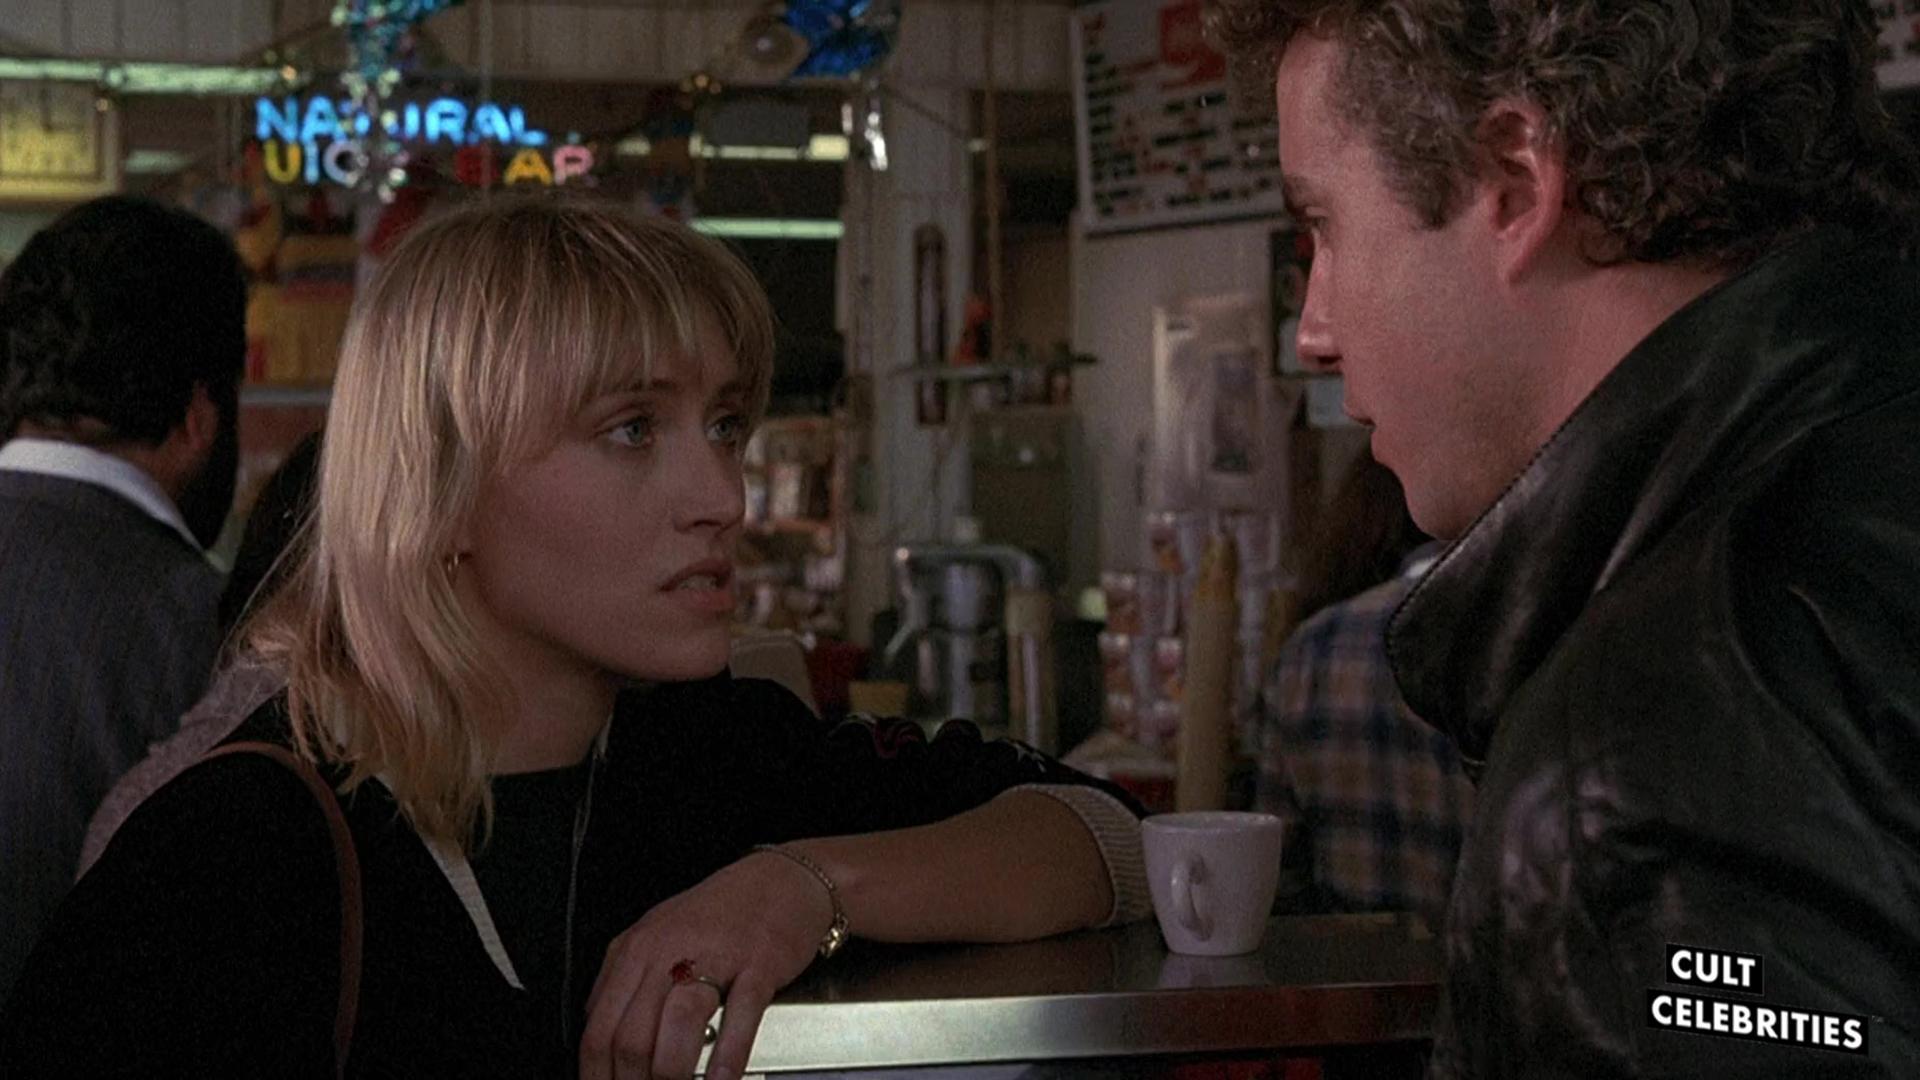 Darlanne Fluegel in To Live and Die in LA (1985)